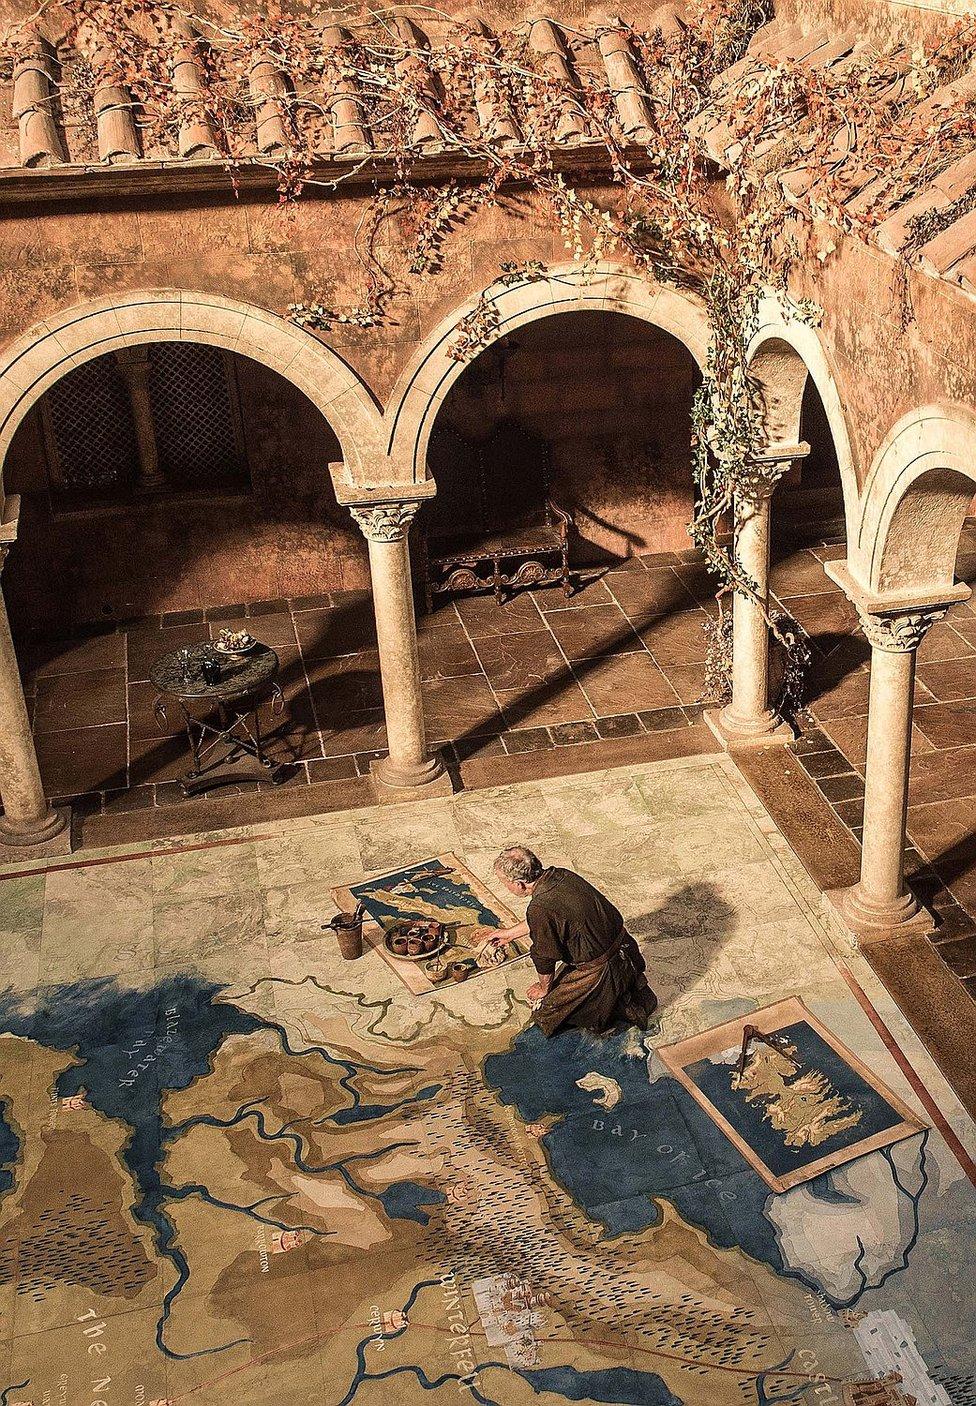 game-of-thrones-7x01-en-viv_6sNPwfc-jpg_976x0